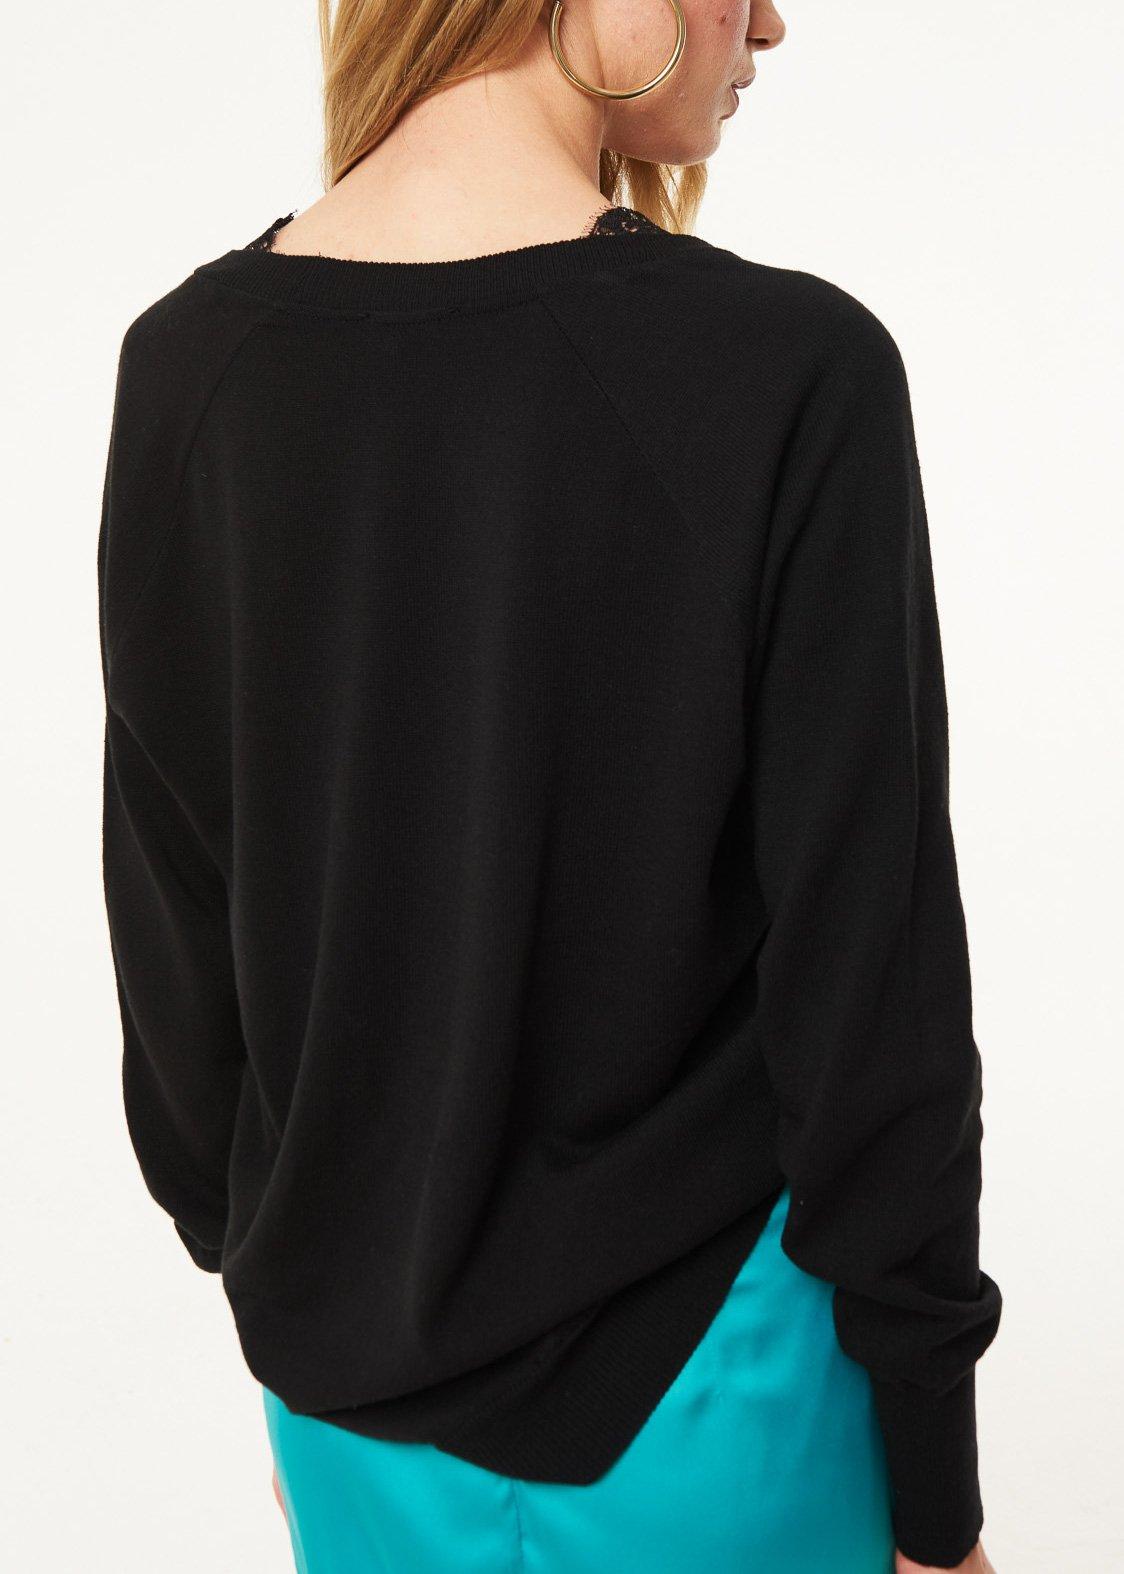 Wool sweater with V-neckline  DENNY ROSE |  | DD500282001